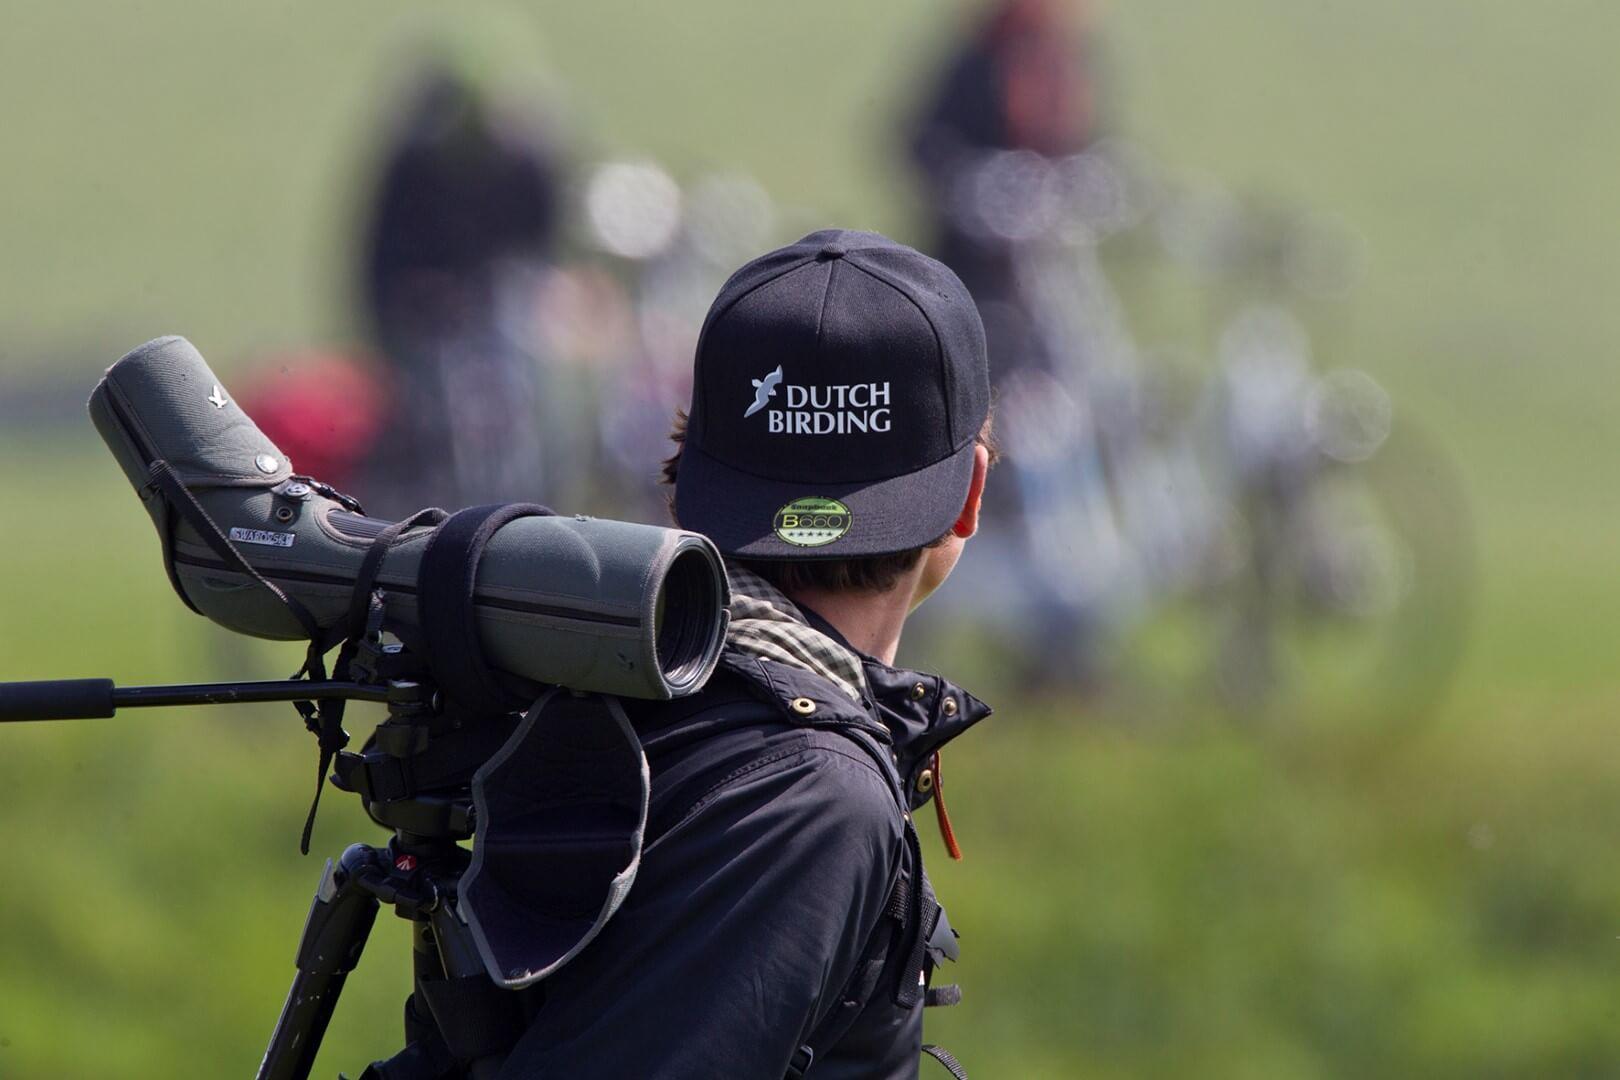 Koen Stork Team Jonge Hondjes Texel NH 6 mei 2017 HVD4931 Large